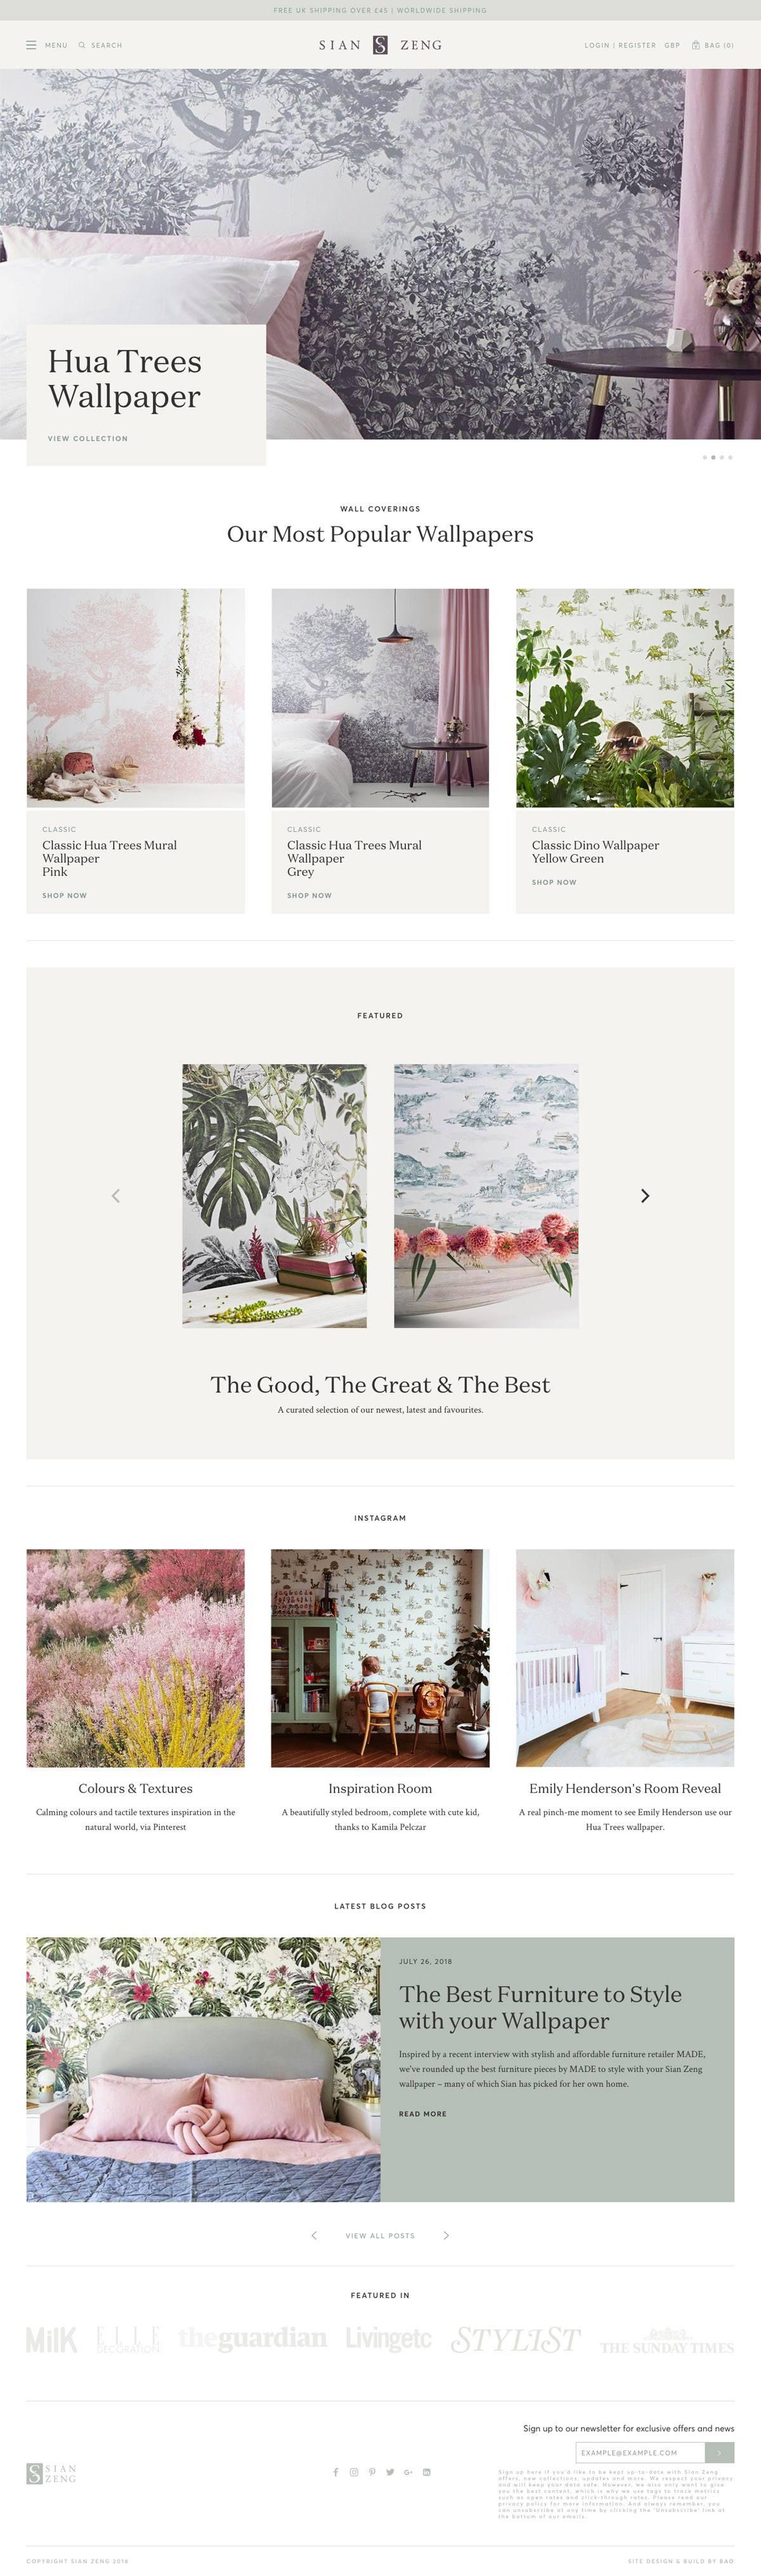 eCommerce website: Sian Zeng